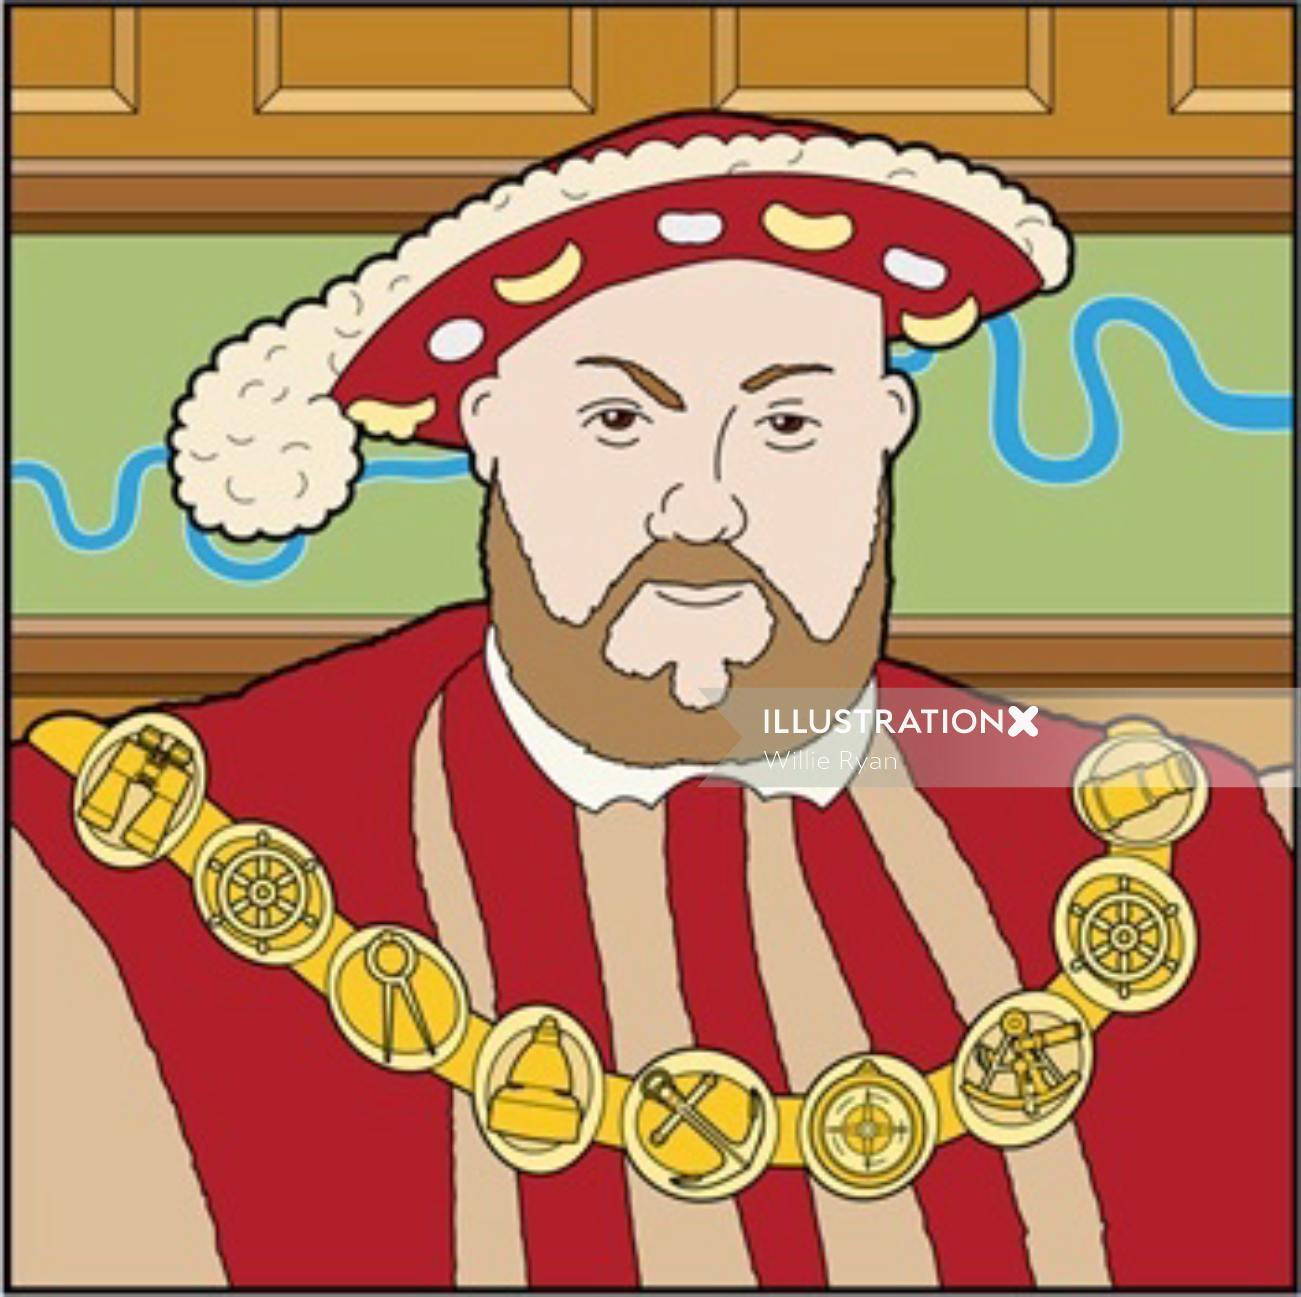 King of England portrait illustration